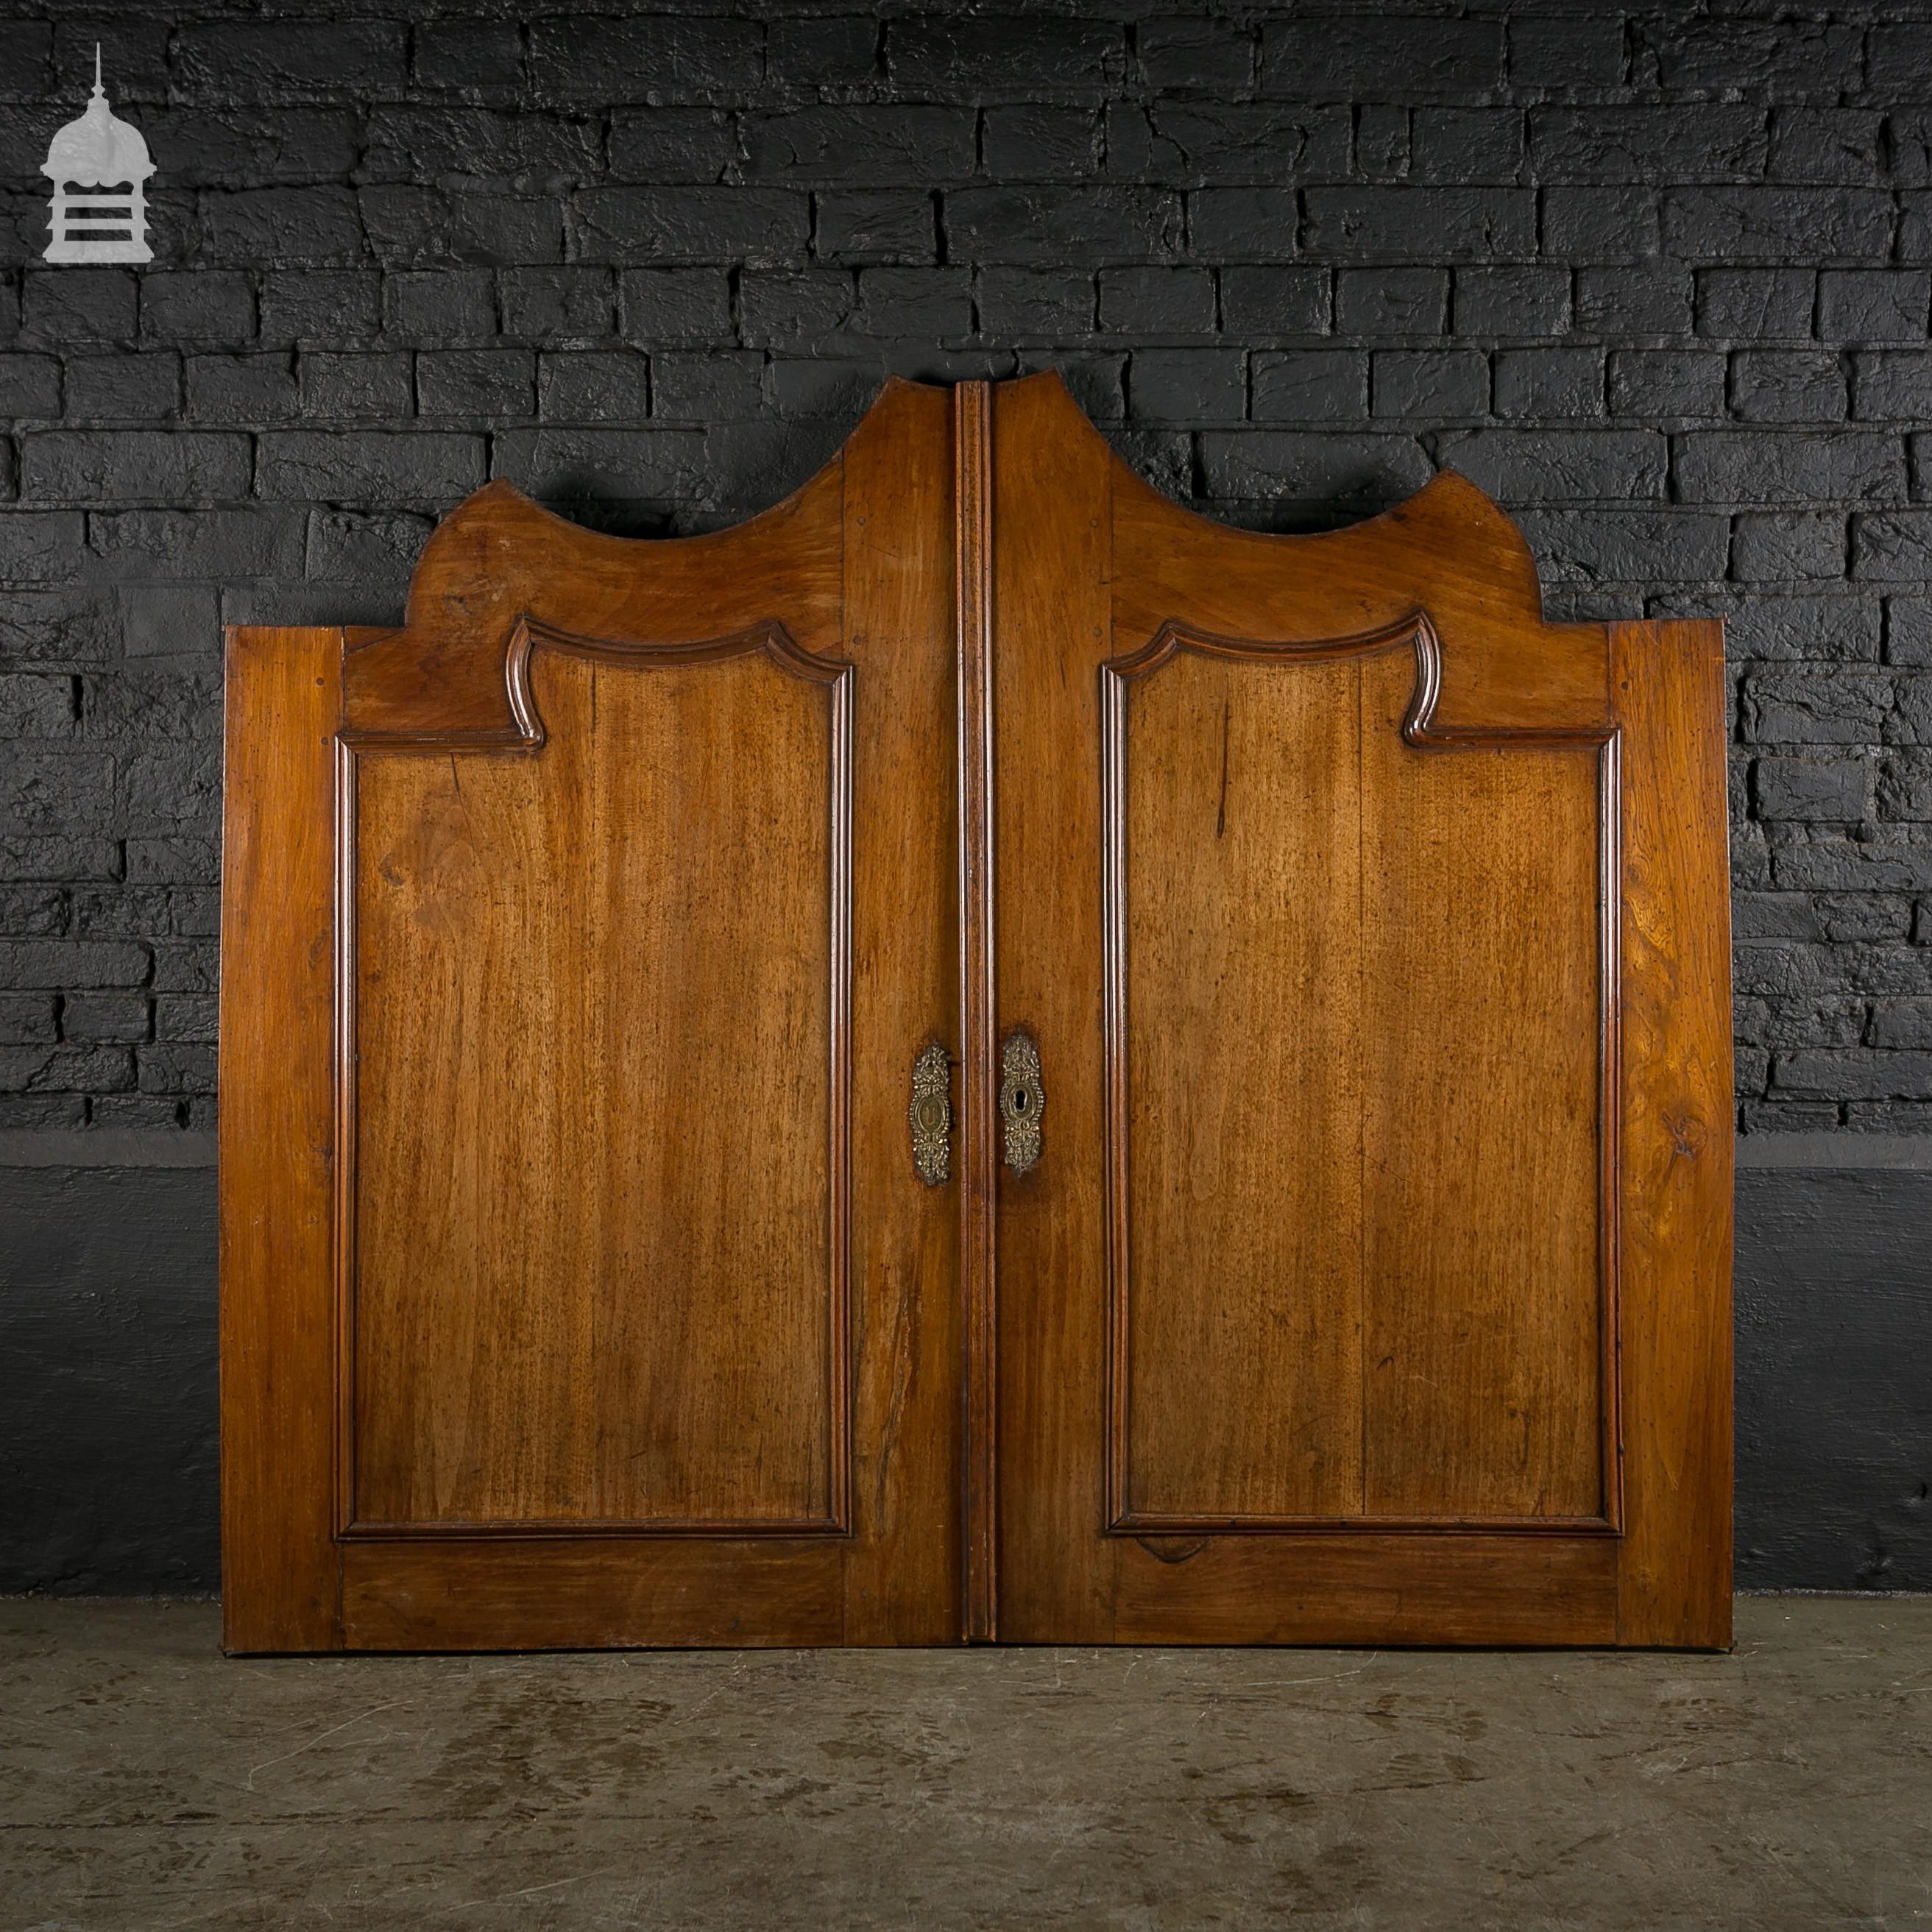 Large 19th c french mahogany cupboard doors for Mahogany french doors